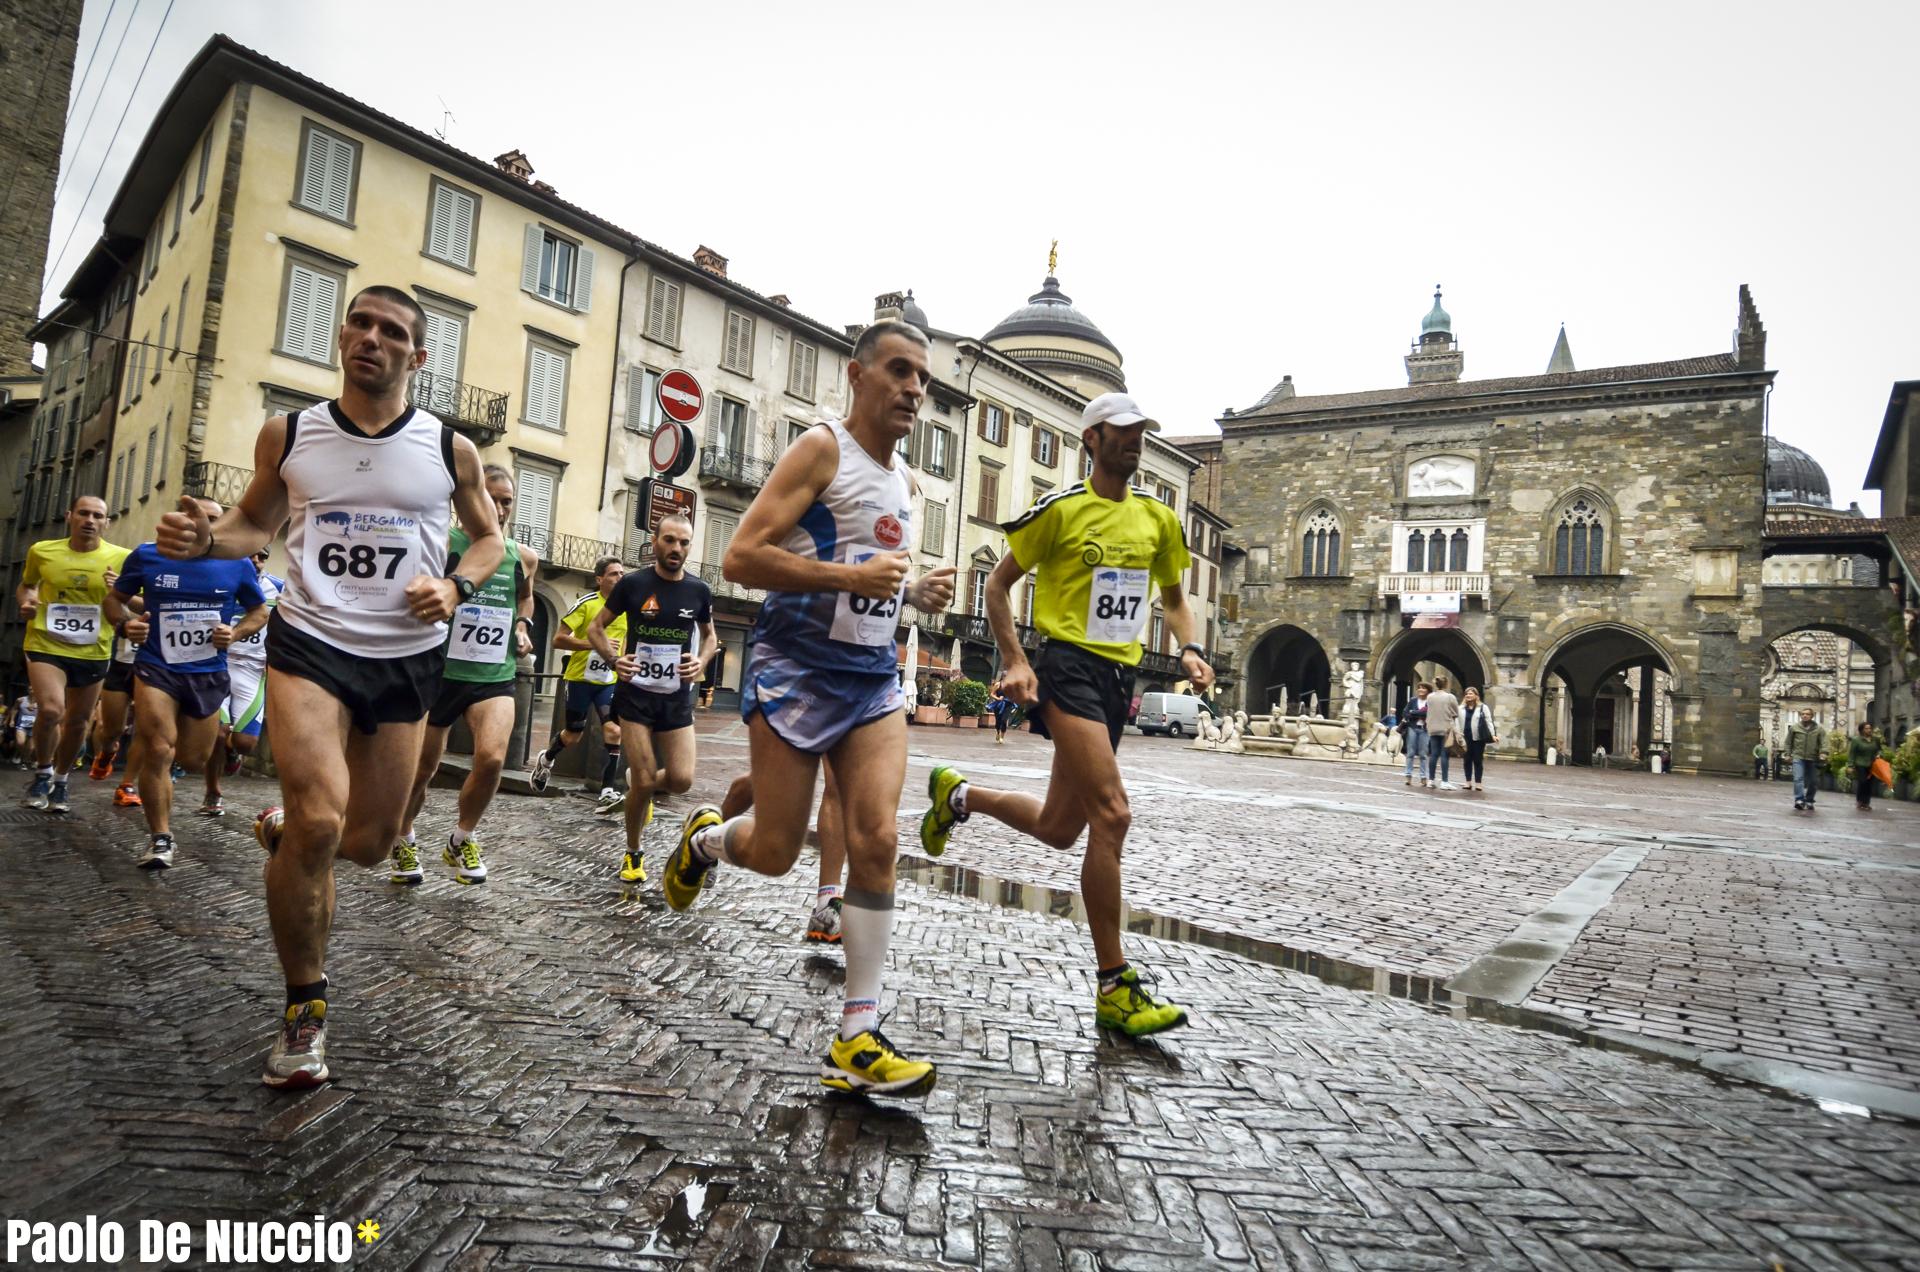 Mezza maratona BergamoMezza maratona Bergamo